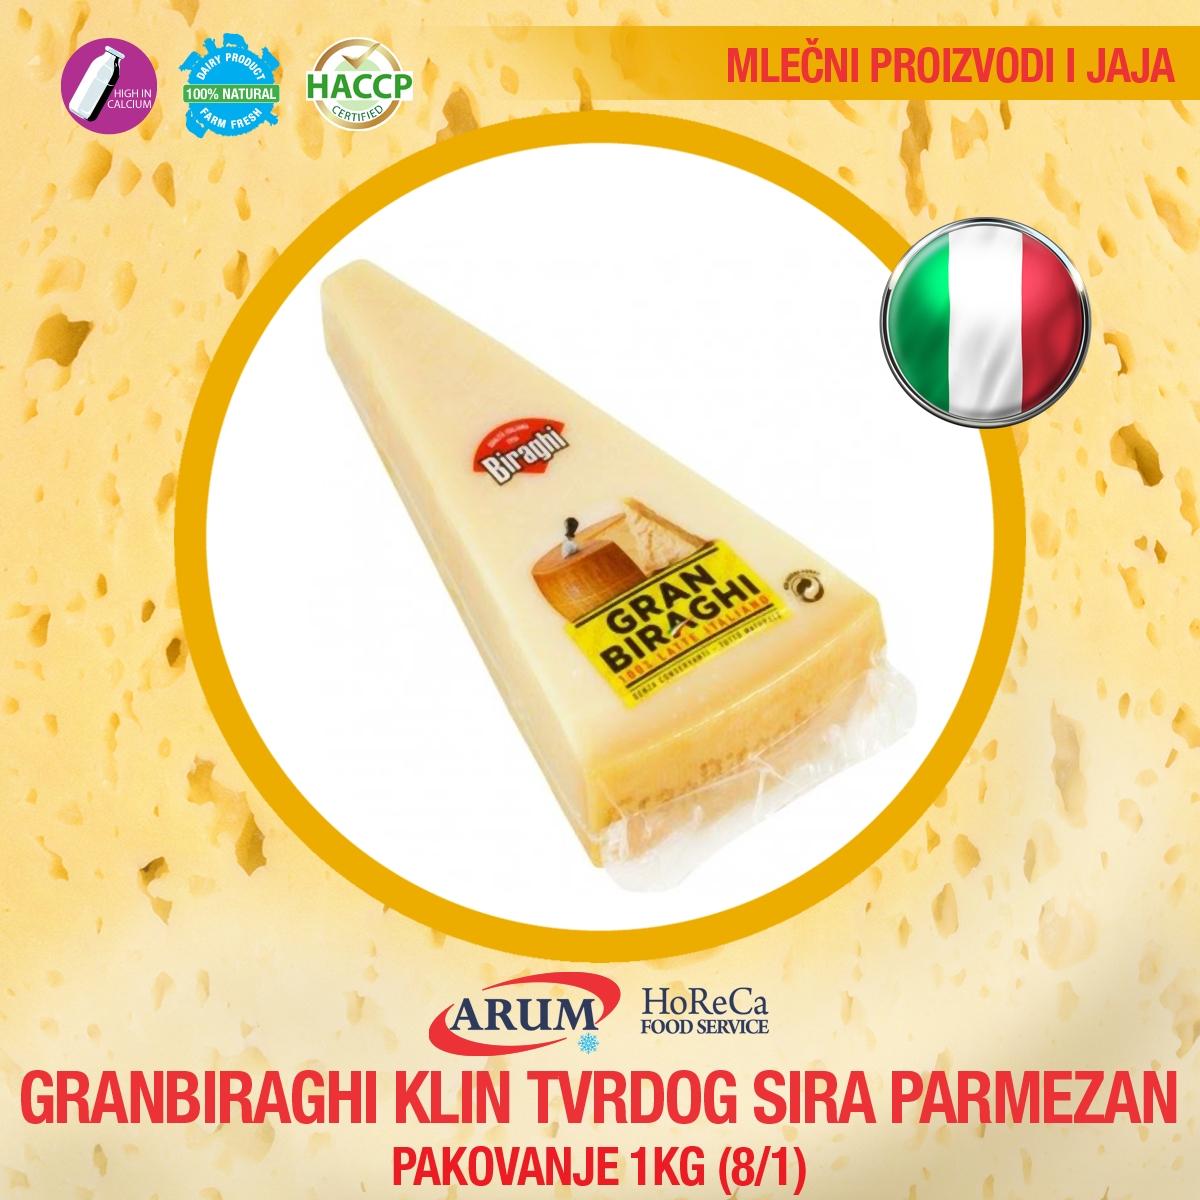 Granbiraghi klin tvrdog sira 1kg parmezan (8/1#)